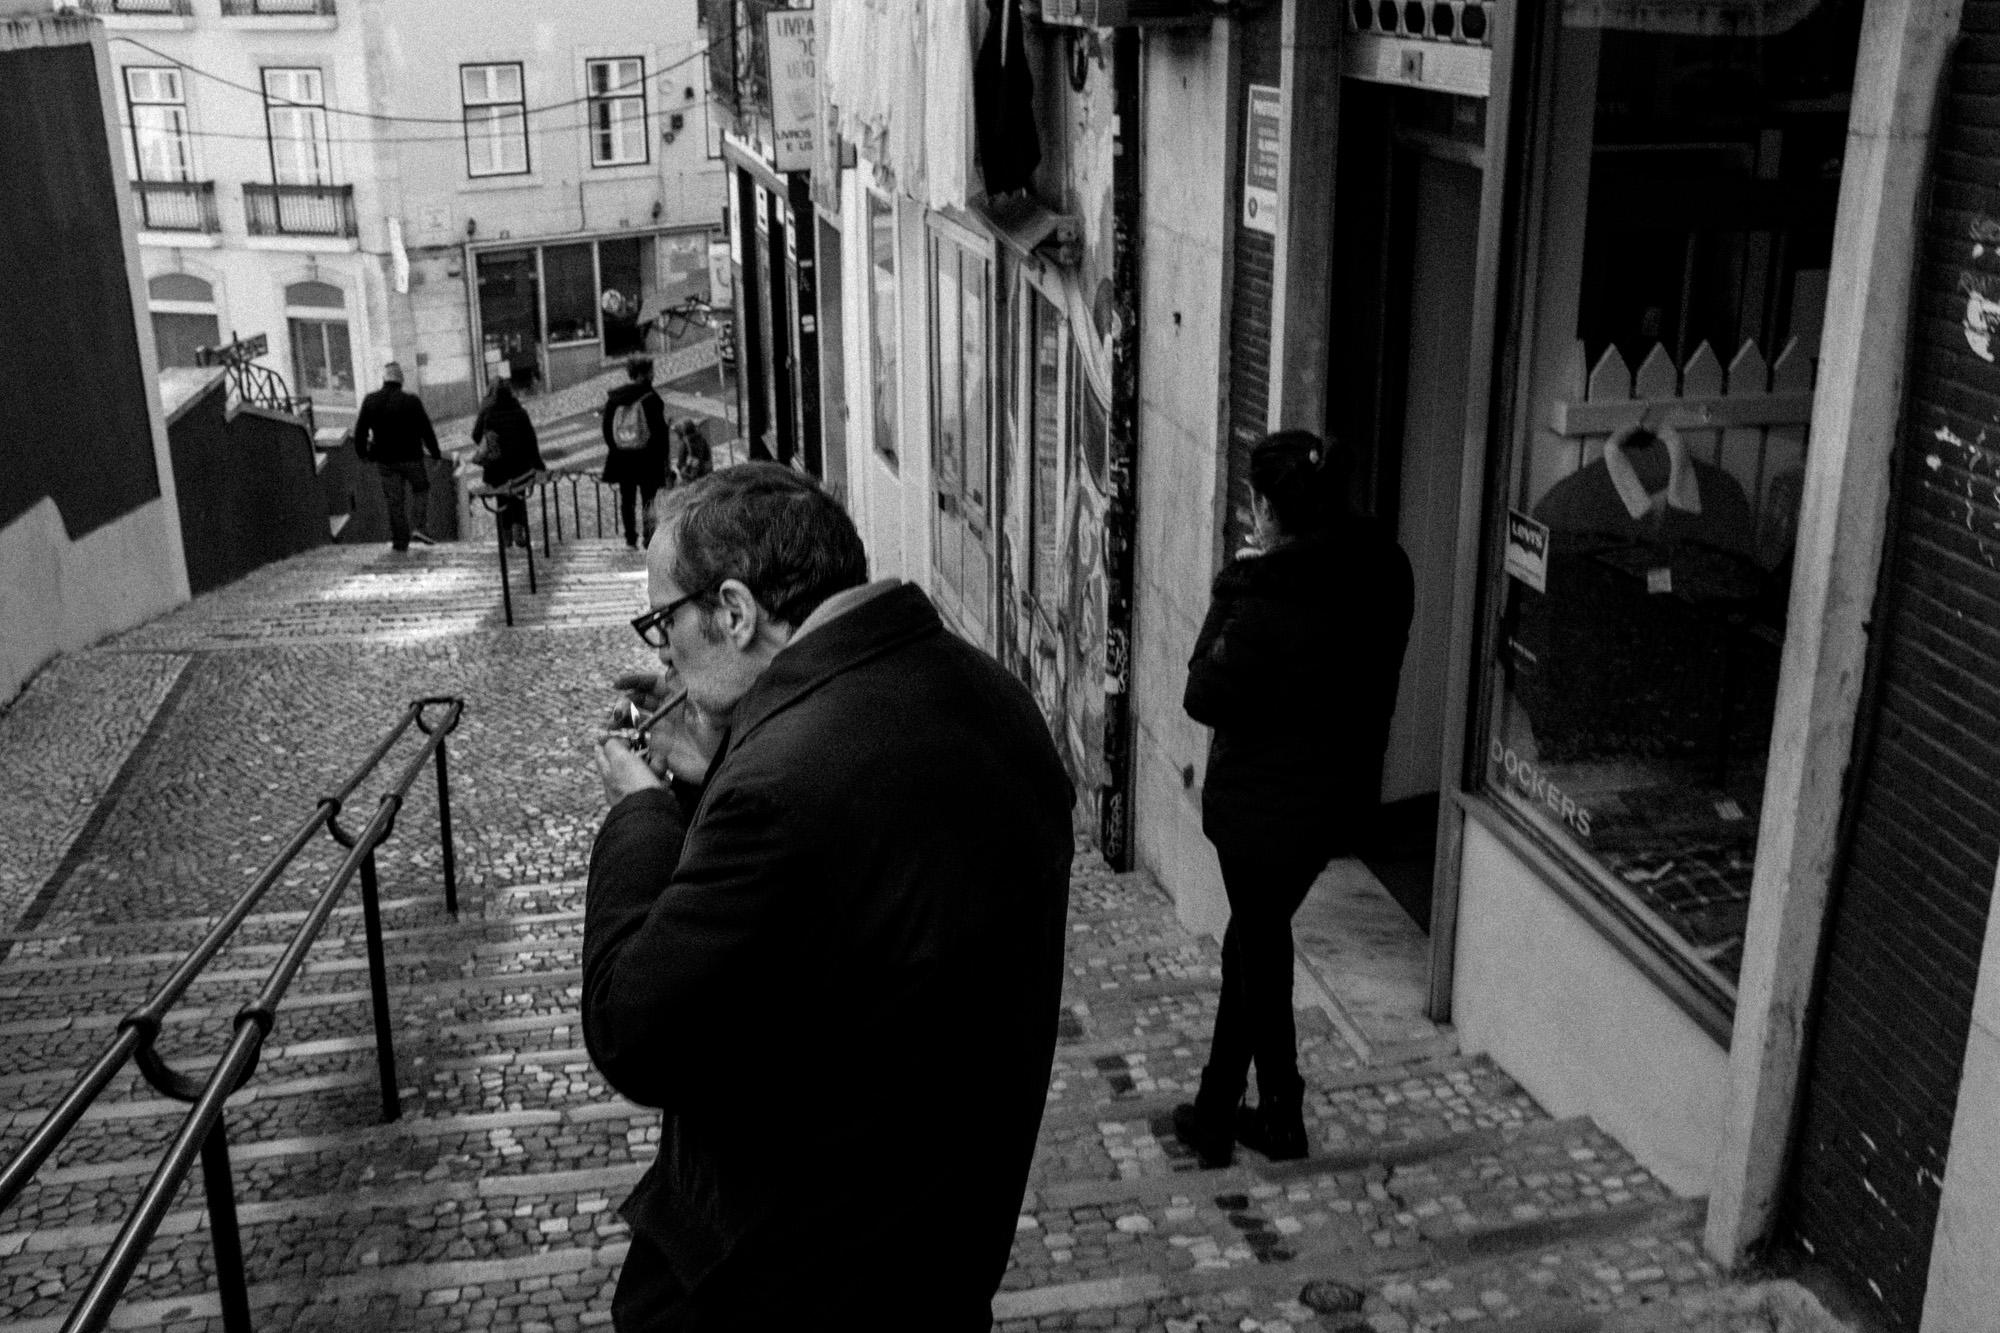 streets-of-lisbon-18.jpg